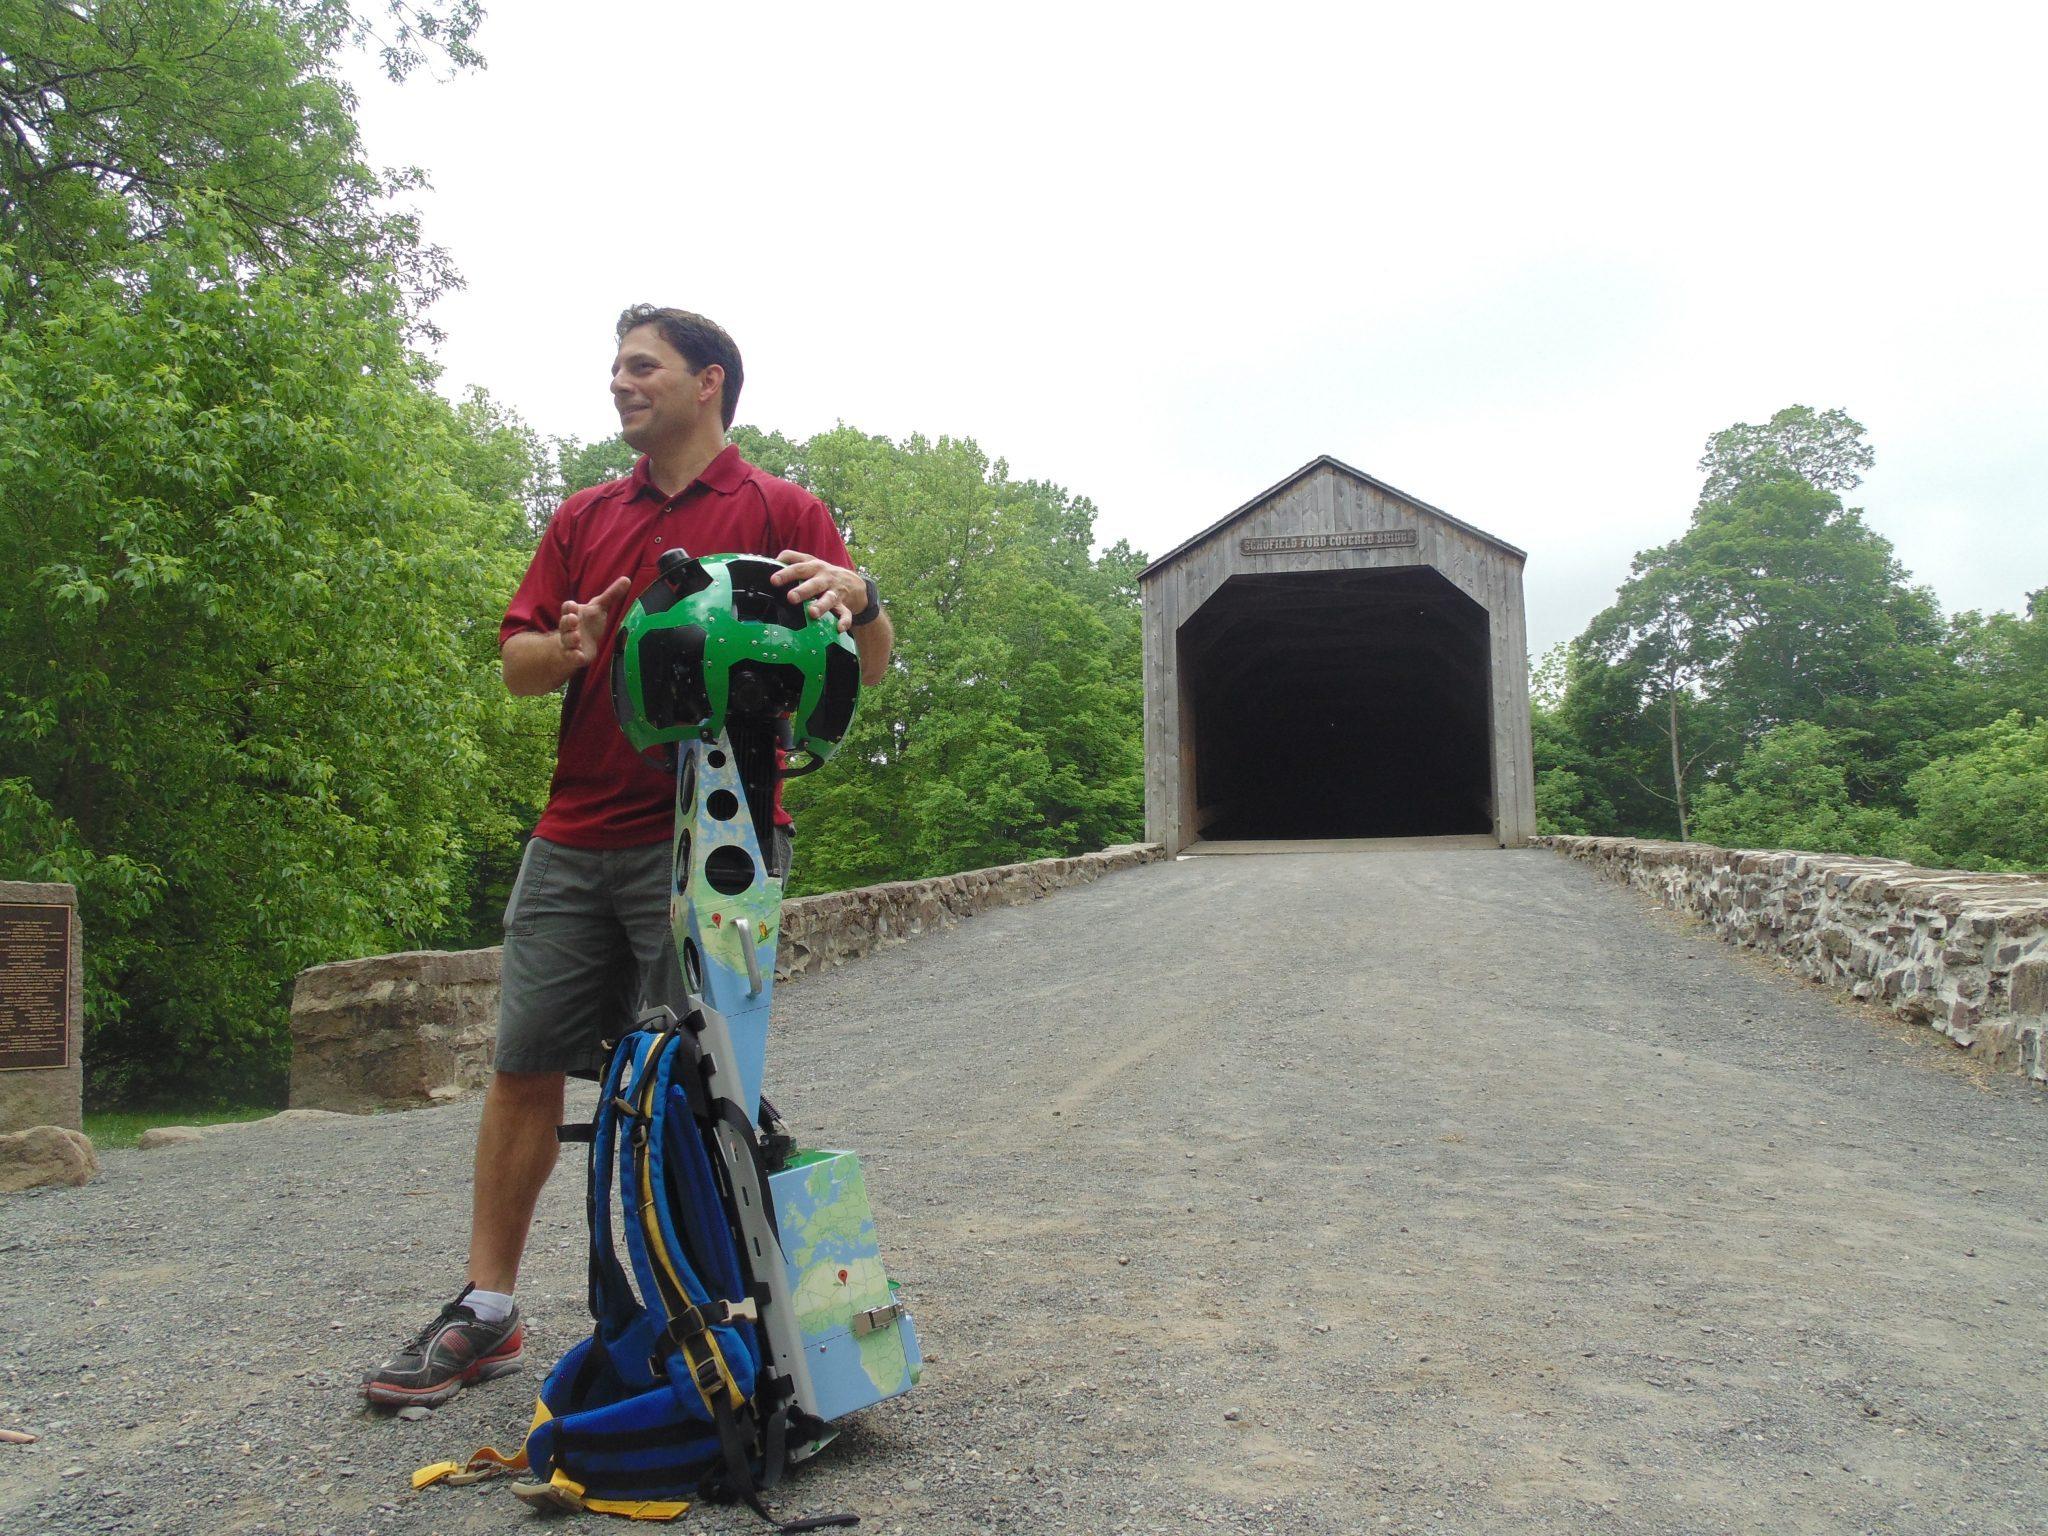 Google Street View Trekker Used To Capture Virtual Images Of Bucks County